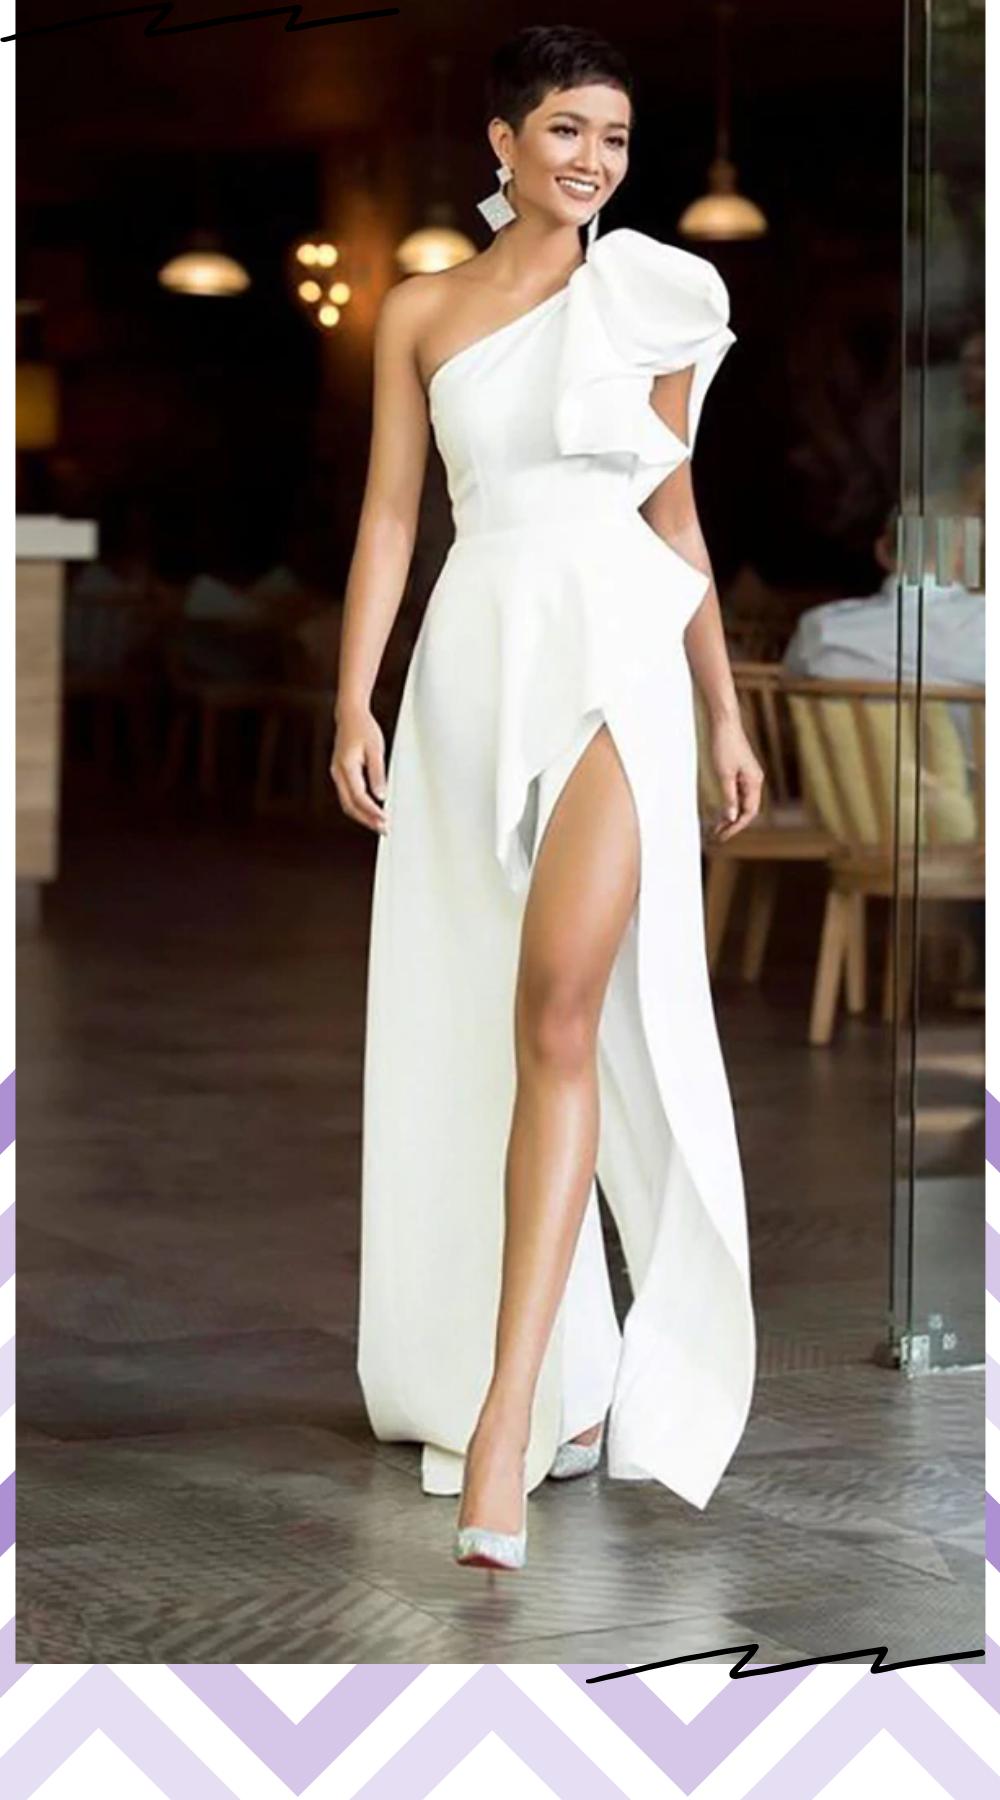 Verngo Simple Evening Dress Warm White Formal Dress